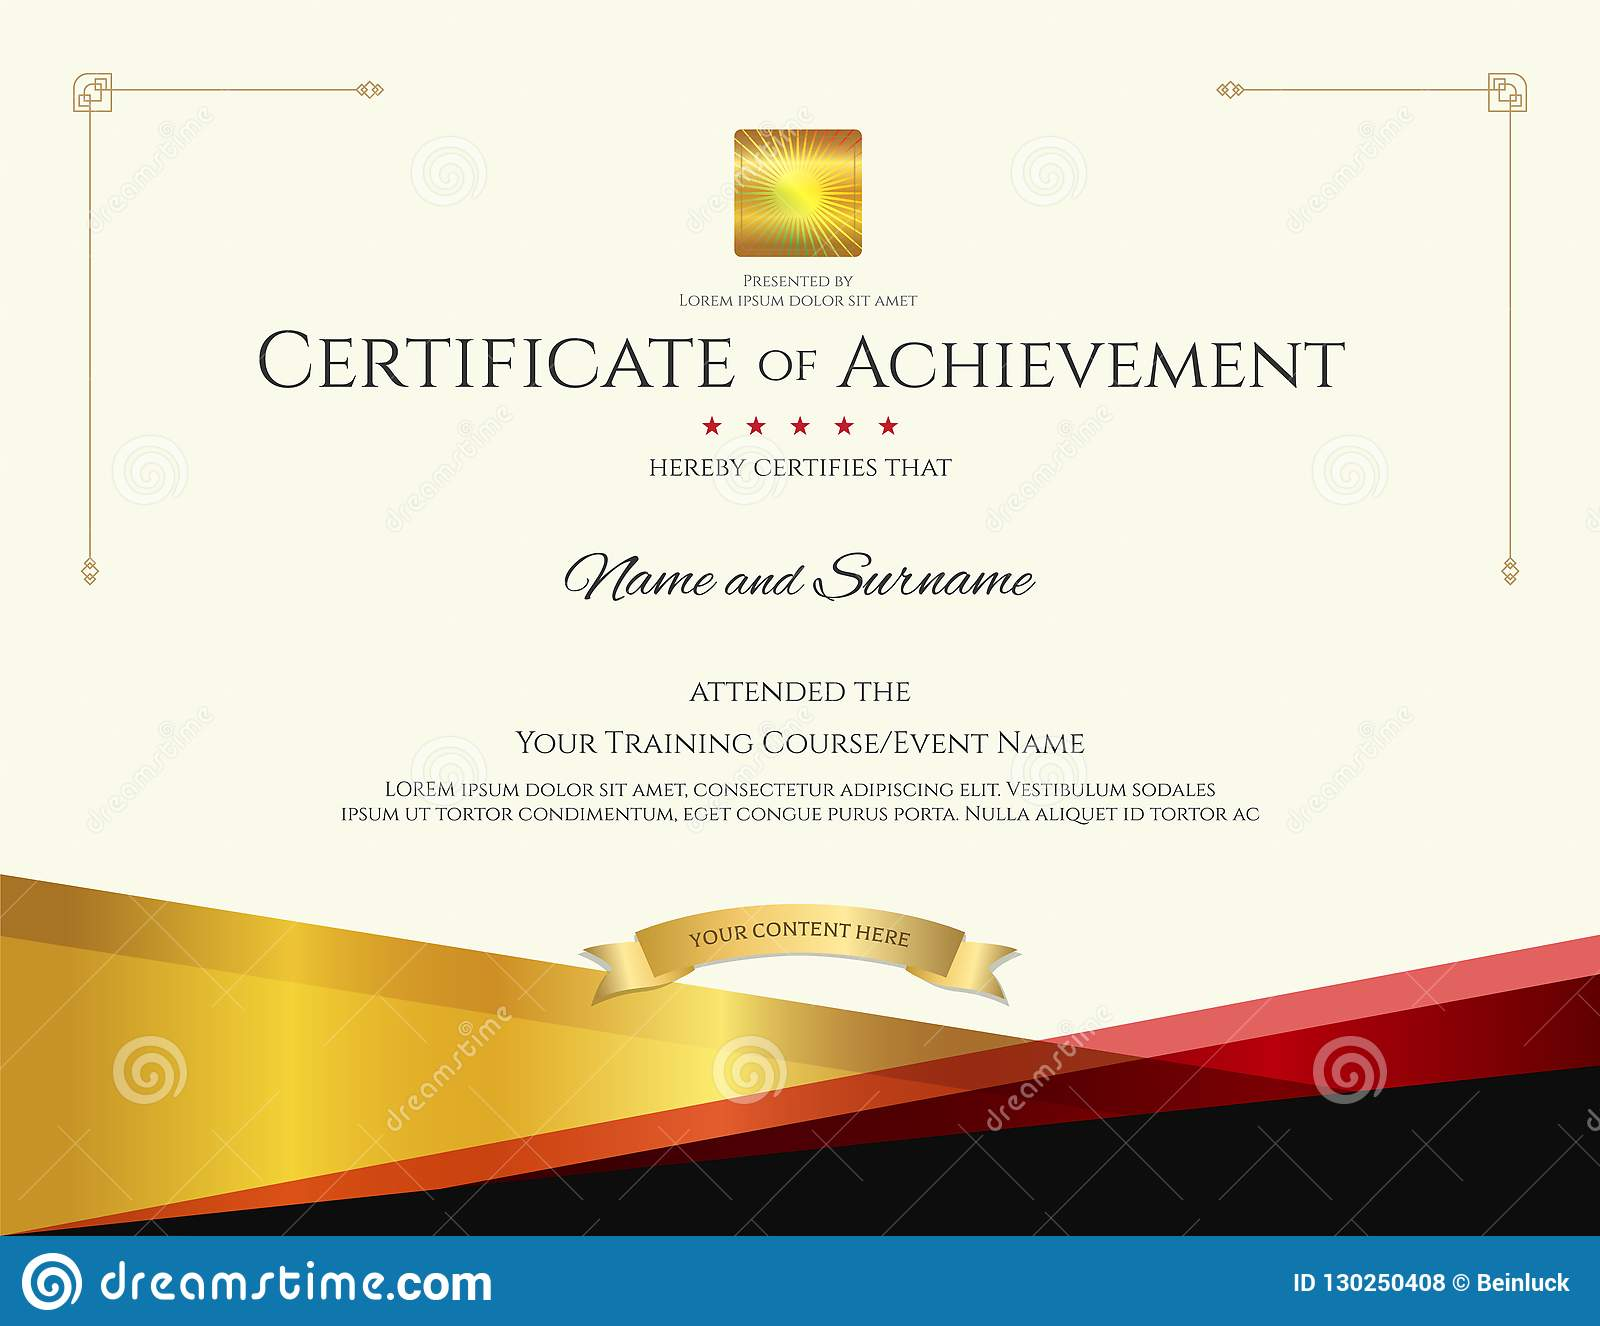 Modern certificate template with elegant border frame, Diploma d